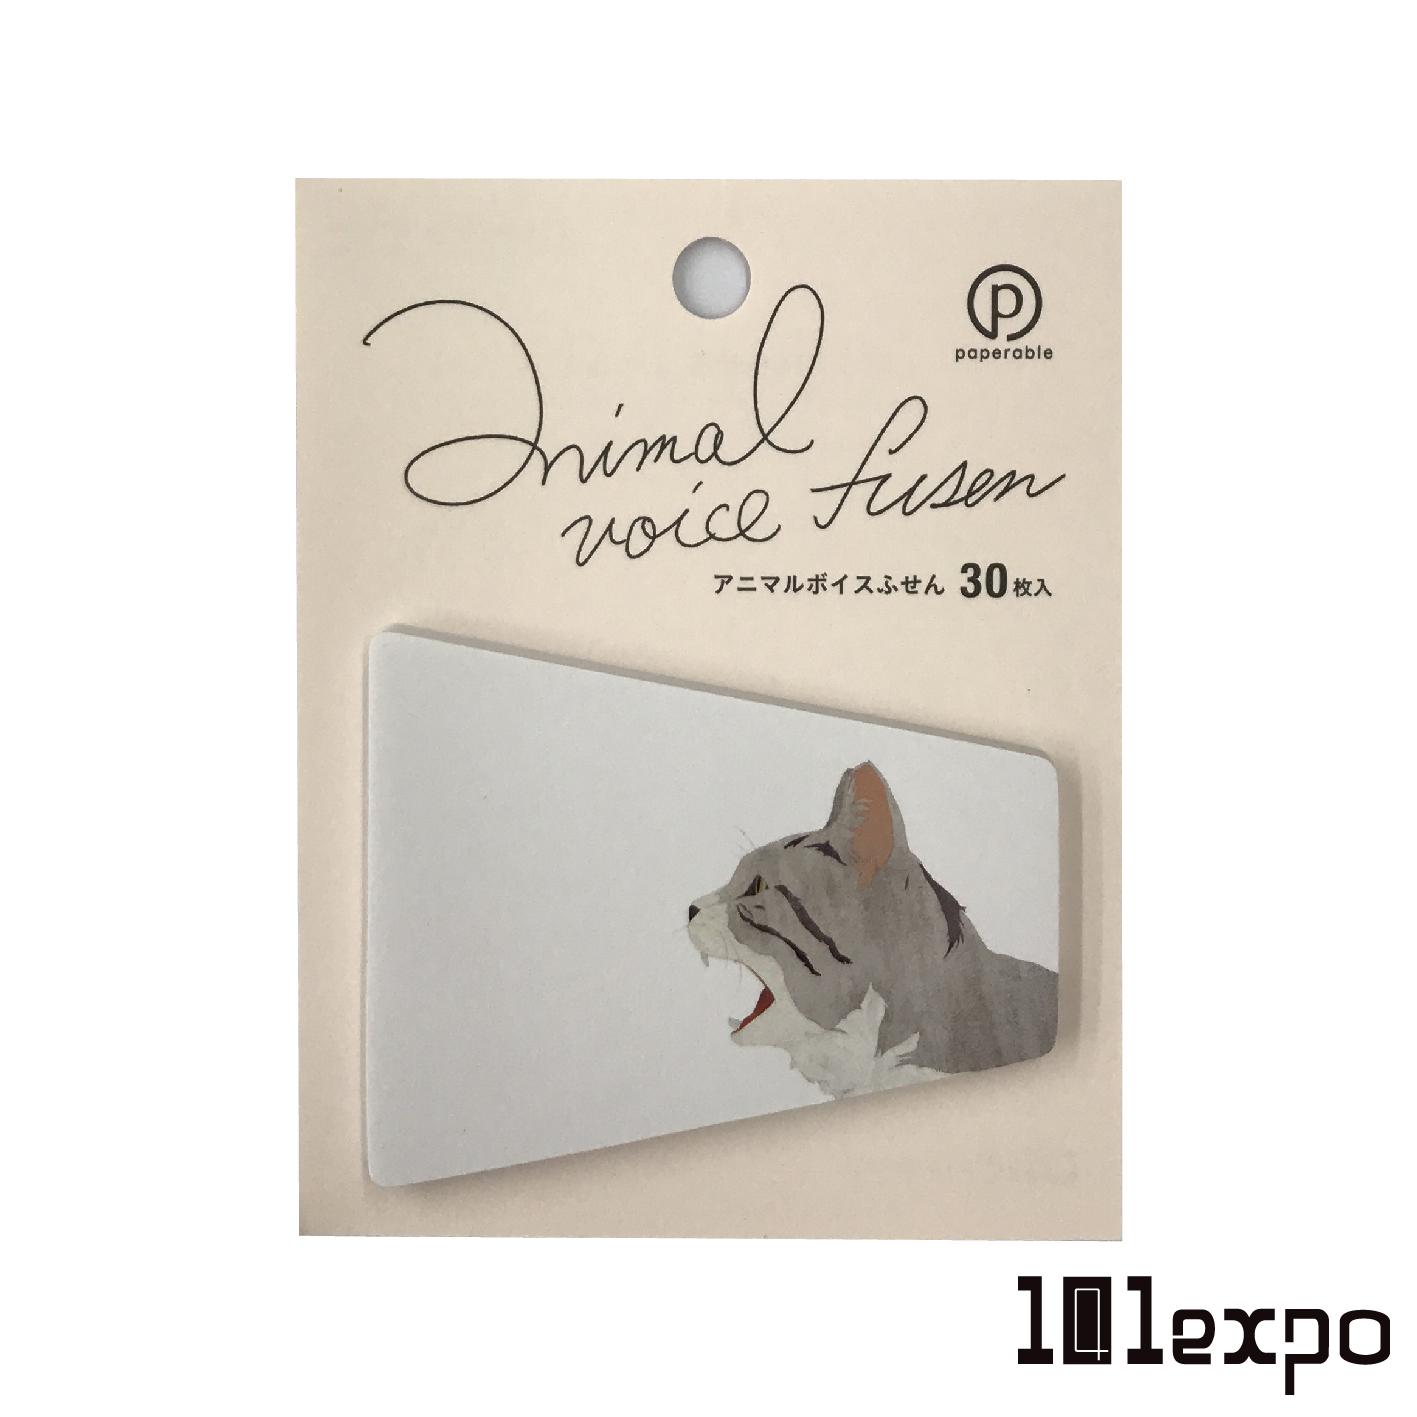 paperable MEMO紙 (10款)